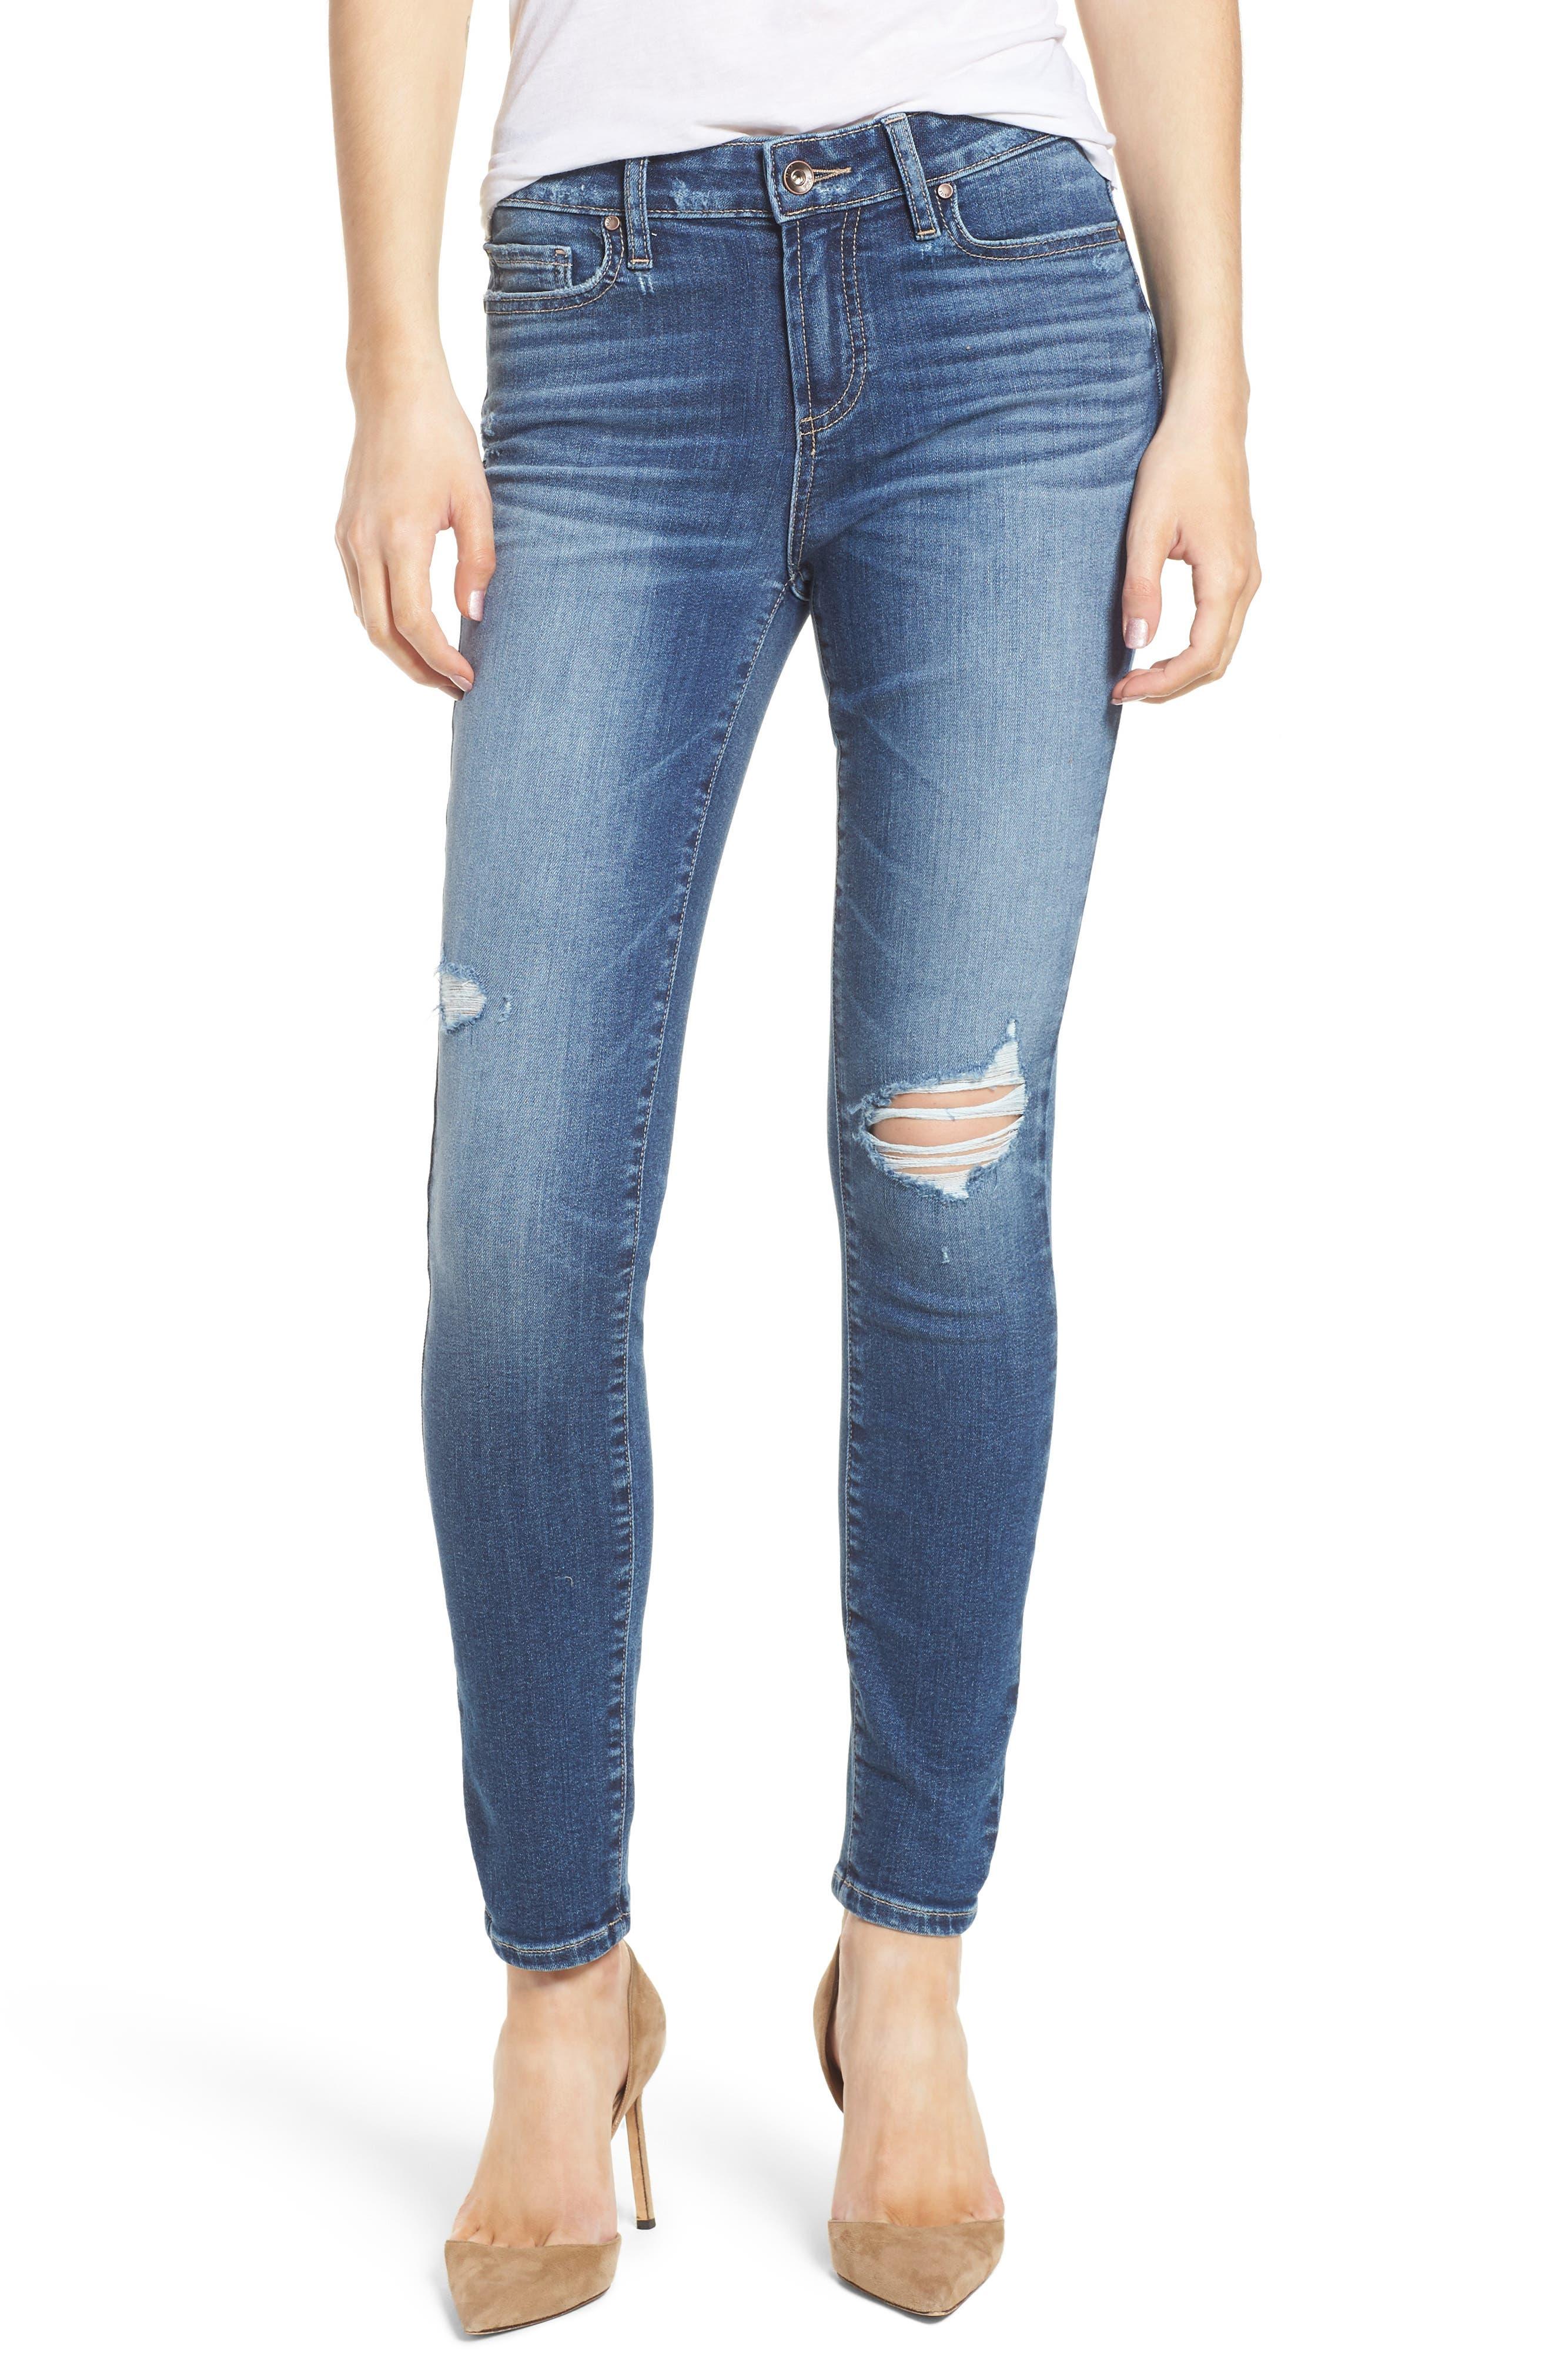 Transcend Vintage - Verdugo Ankle Skinny Jeans,                             Main thumbnail 1, color,                             Pico Destructed